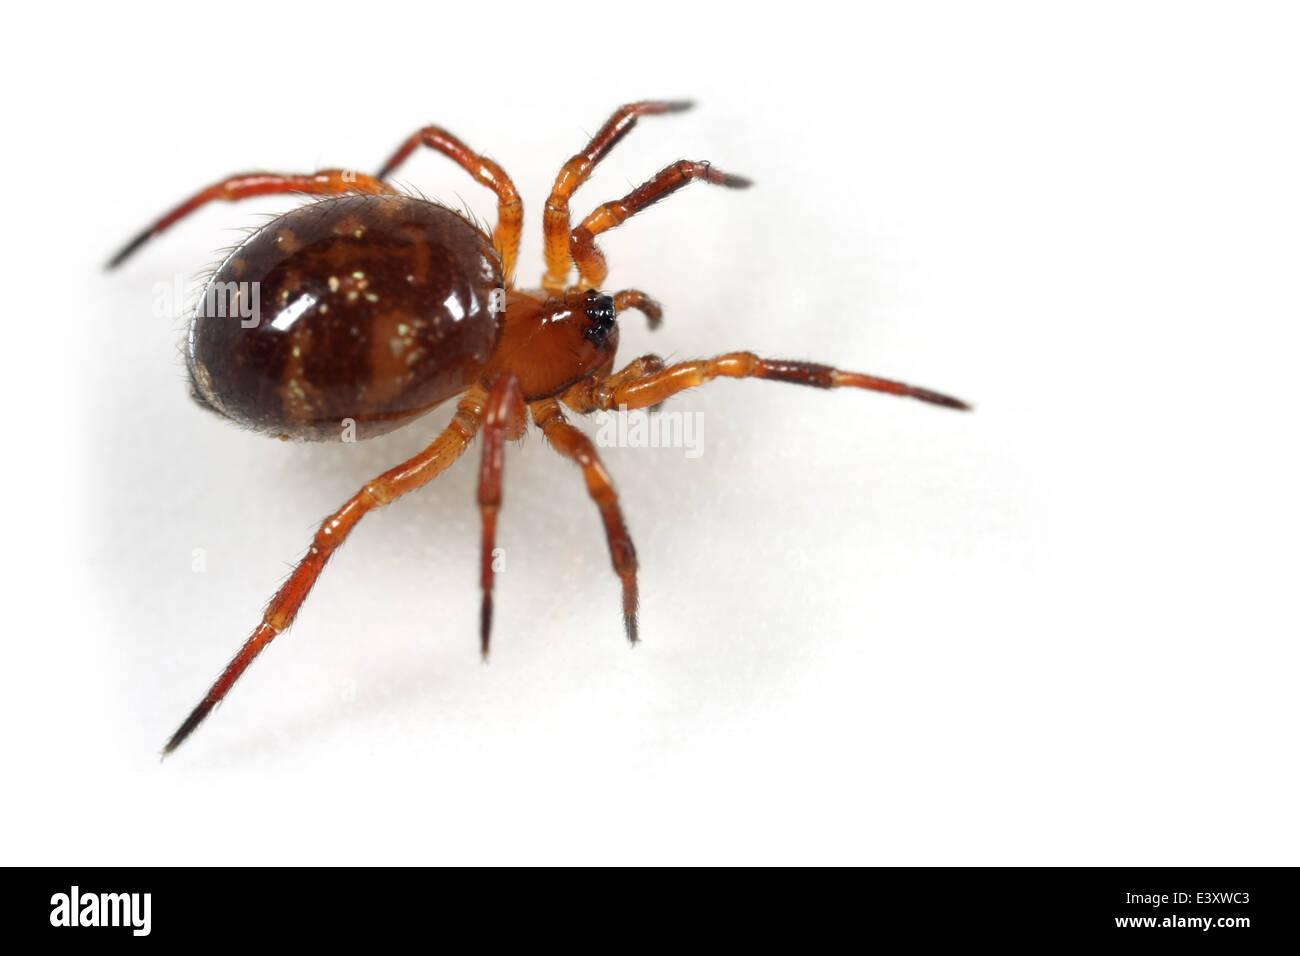 Female Euryopis flavomaculata spider, part of the family Theridiidae - Cobweb weavers. Isolated on white background. - Stock Image